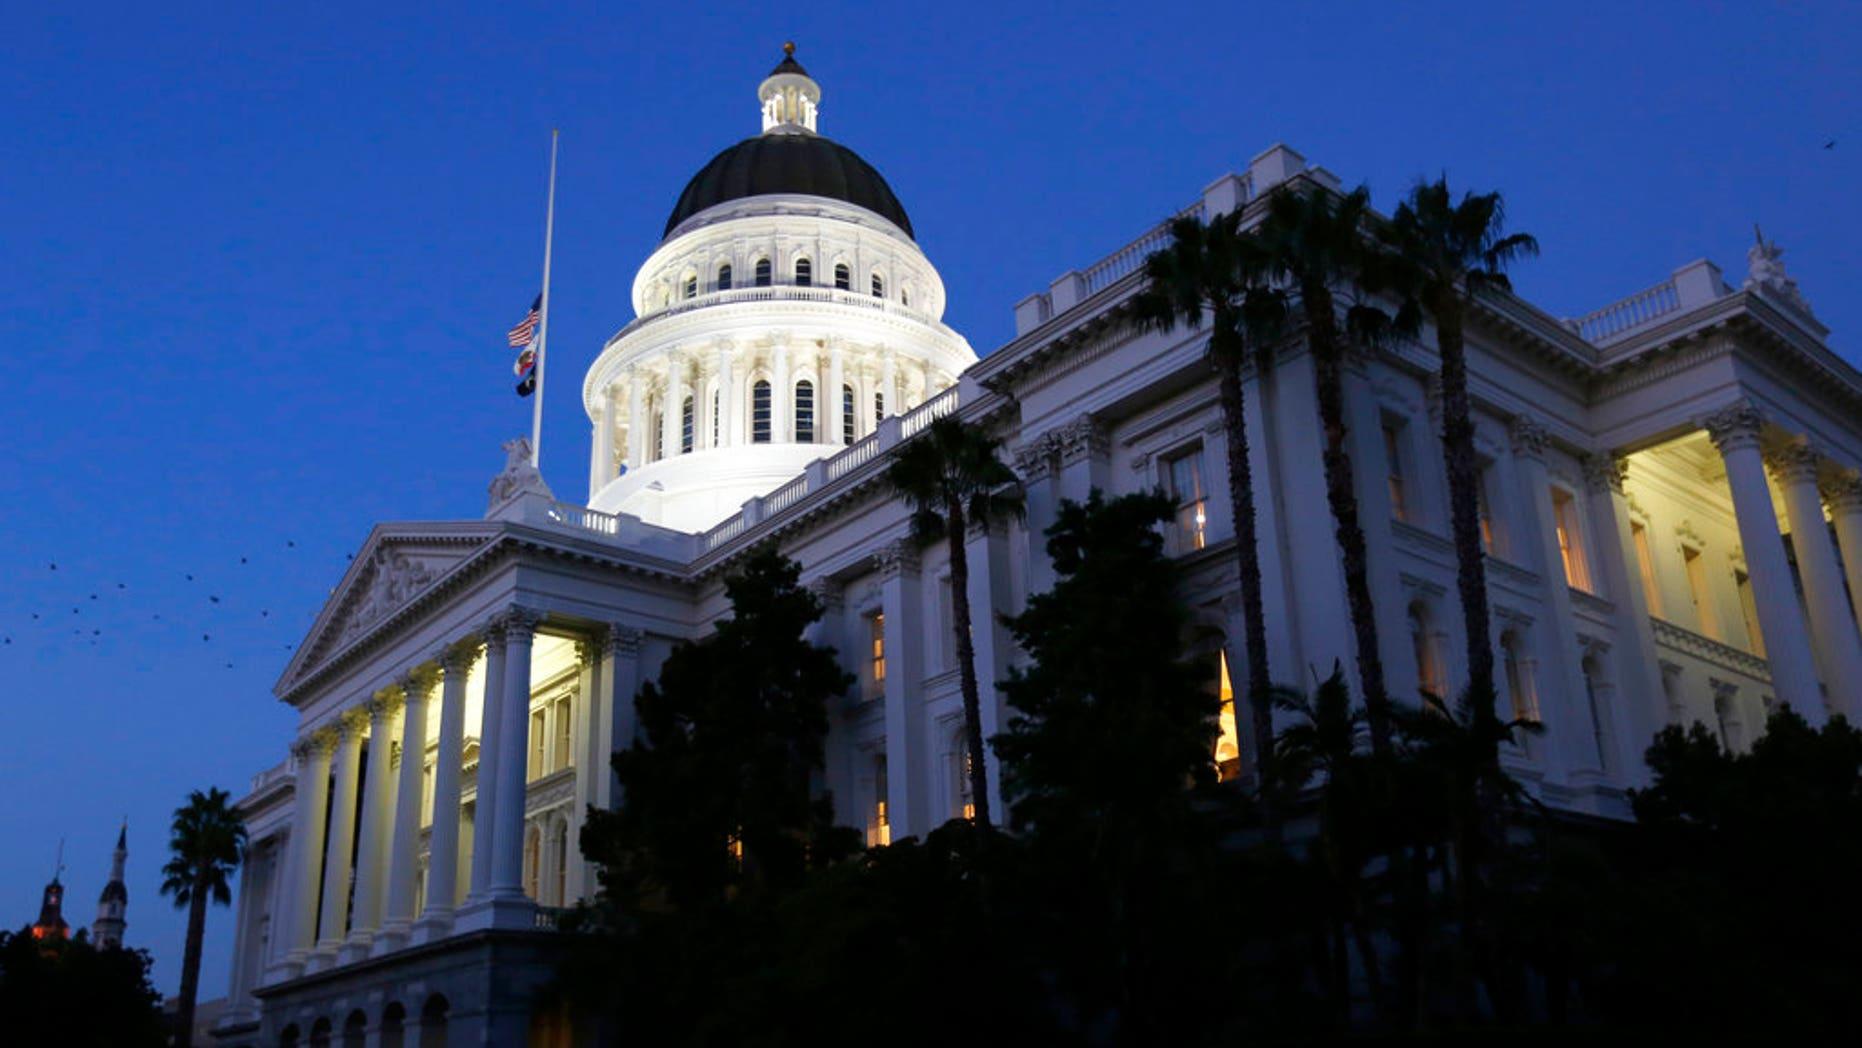 The California Statehouse is seen inSacramento, Aug. 31, 2018. (Associated Press)